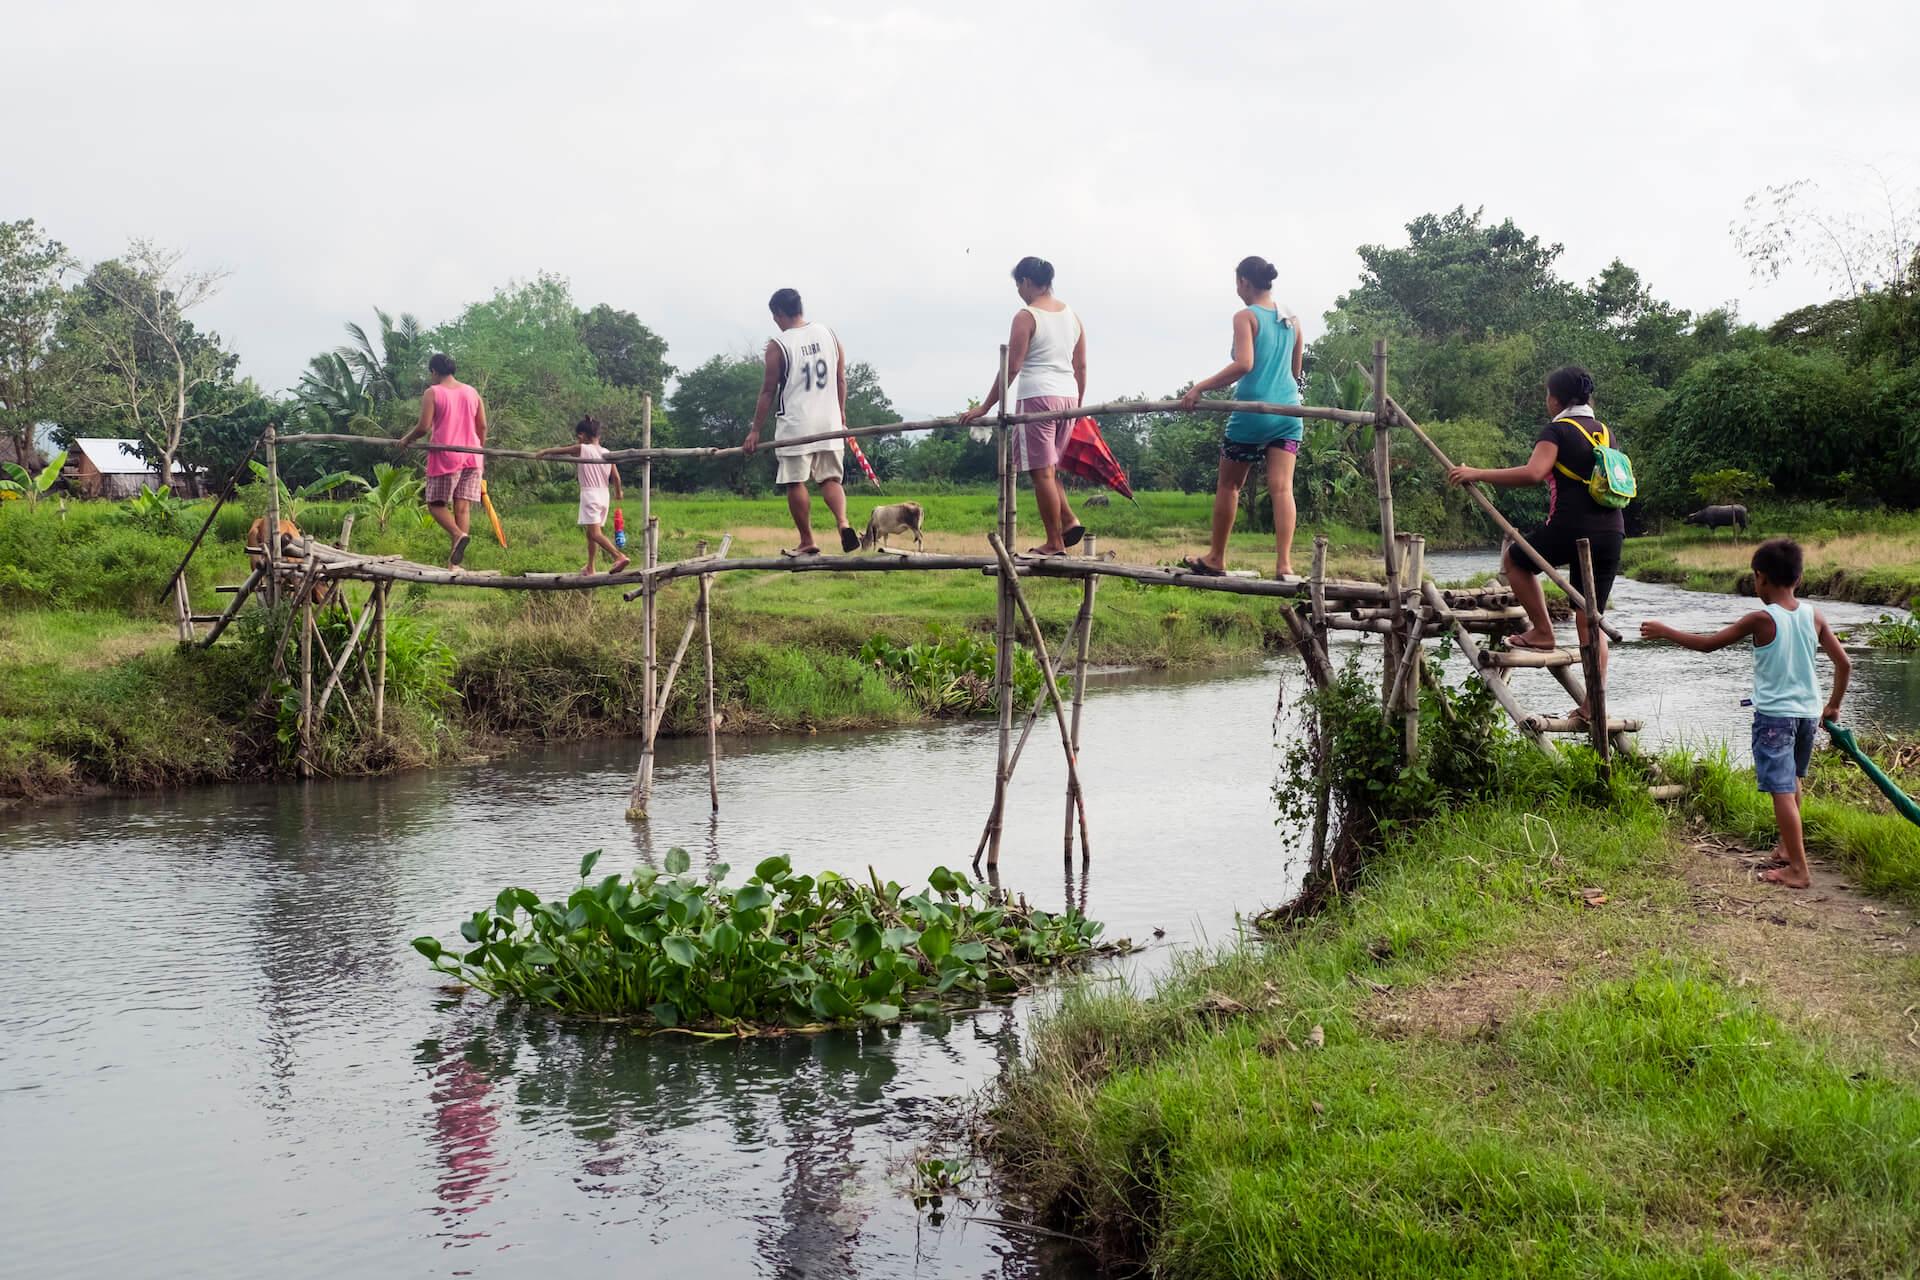 The women cross a bamboo bridge in Brgy. Bulbulala, La Paz, to visit the home of a fellow weaver